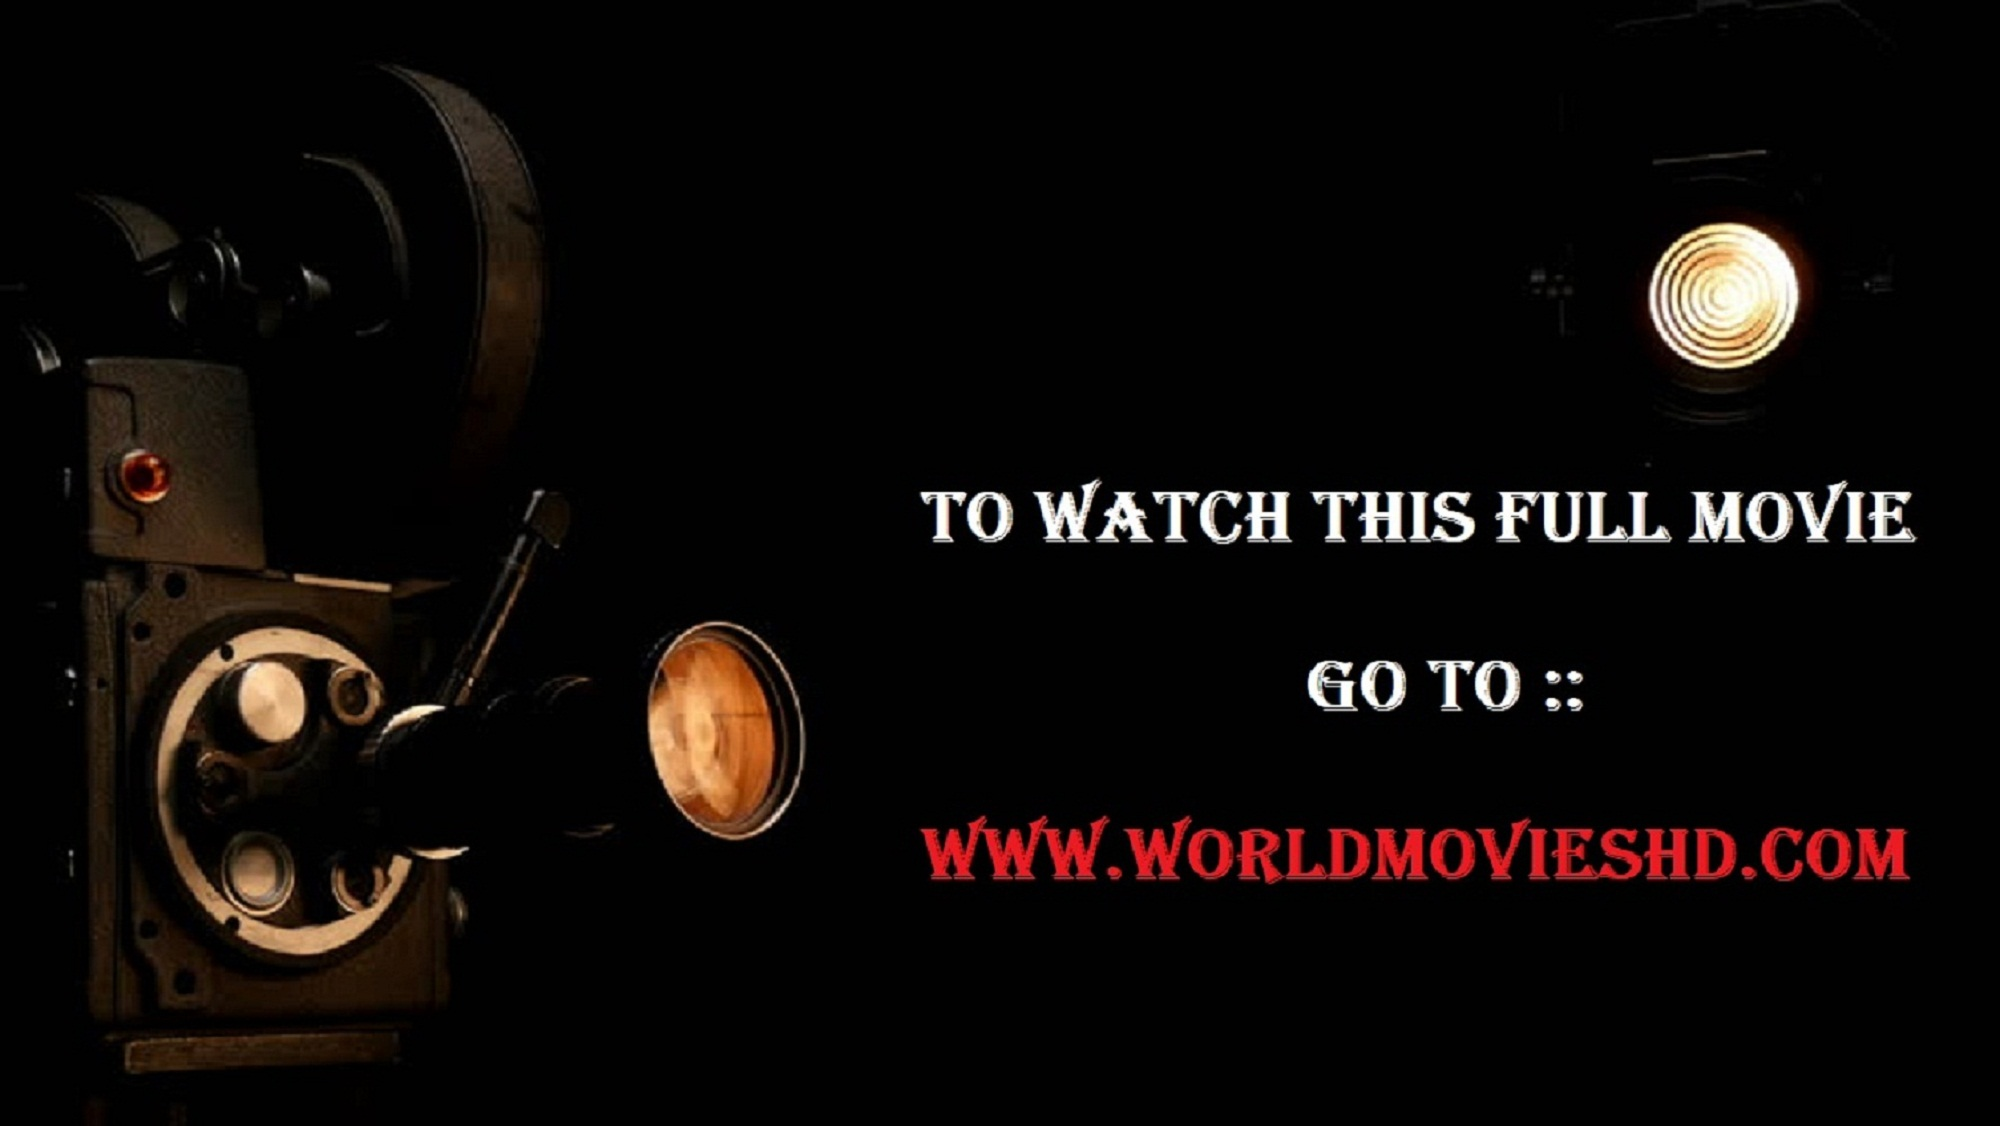 pitch black full movie torrent download